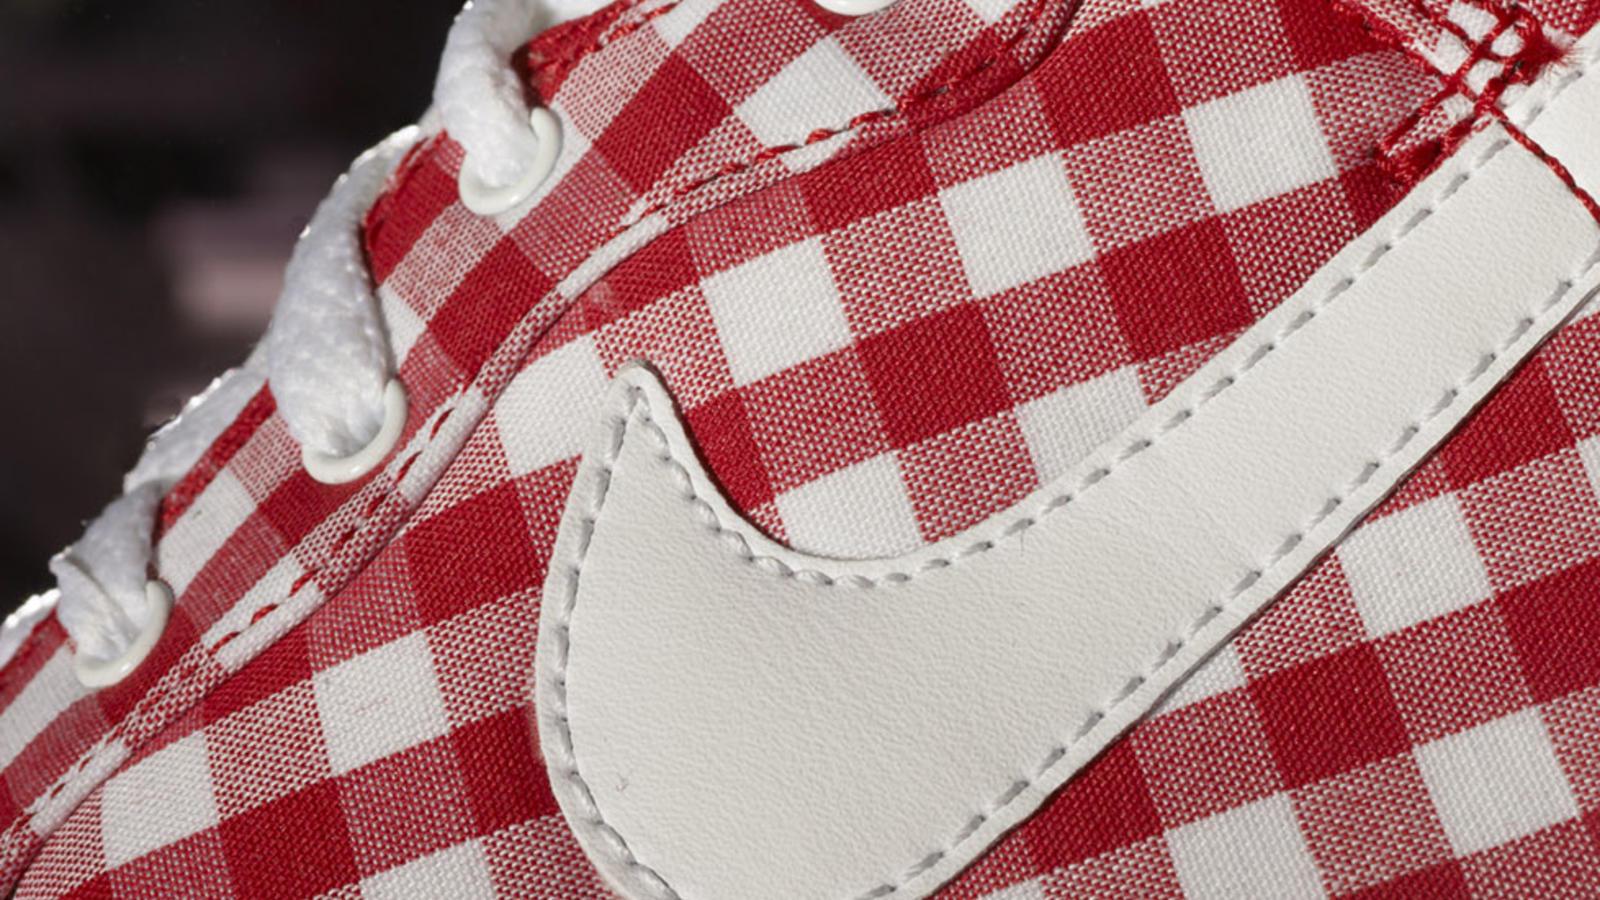 newest f8c54 82e0d fa ho 09 nike sportswear collection